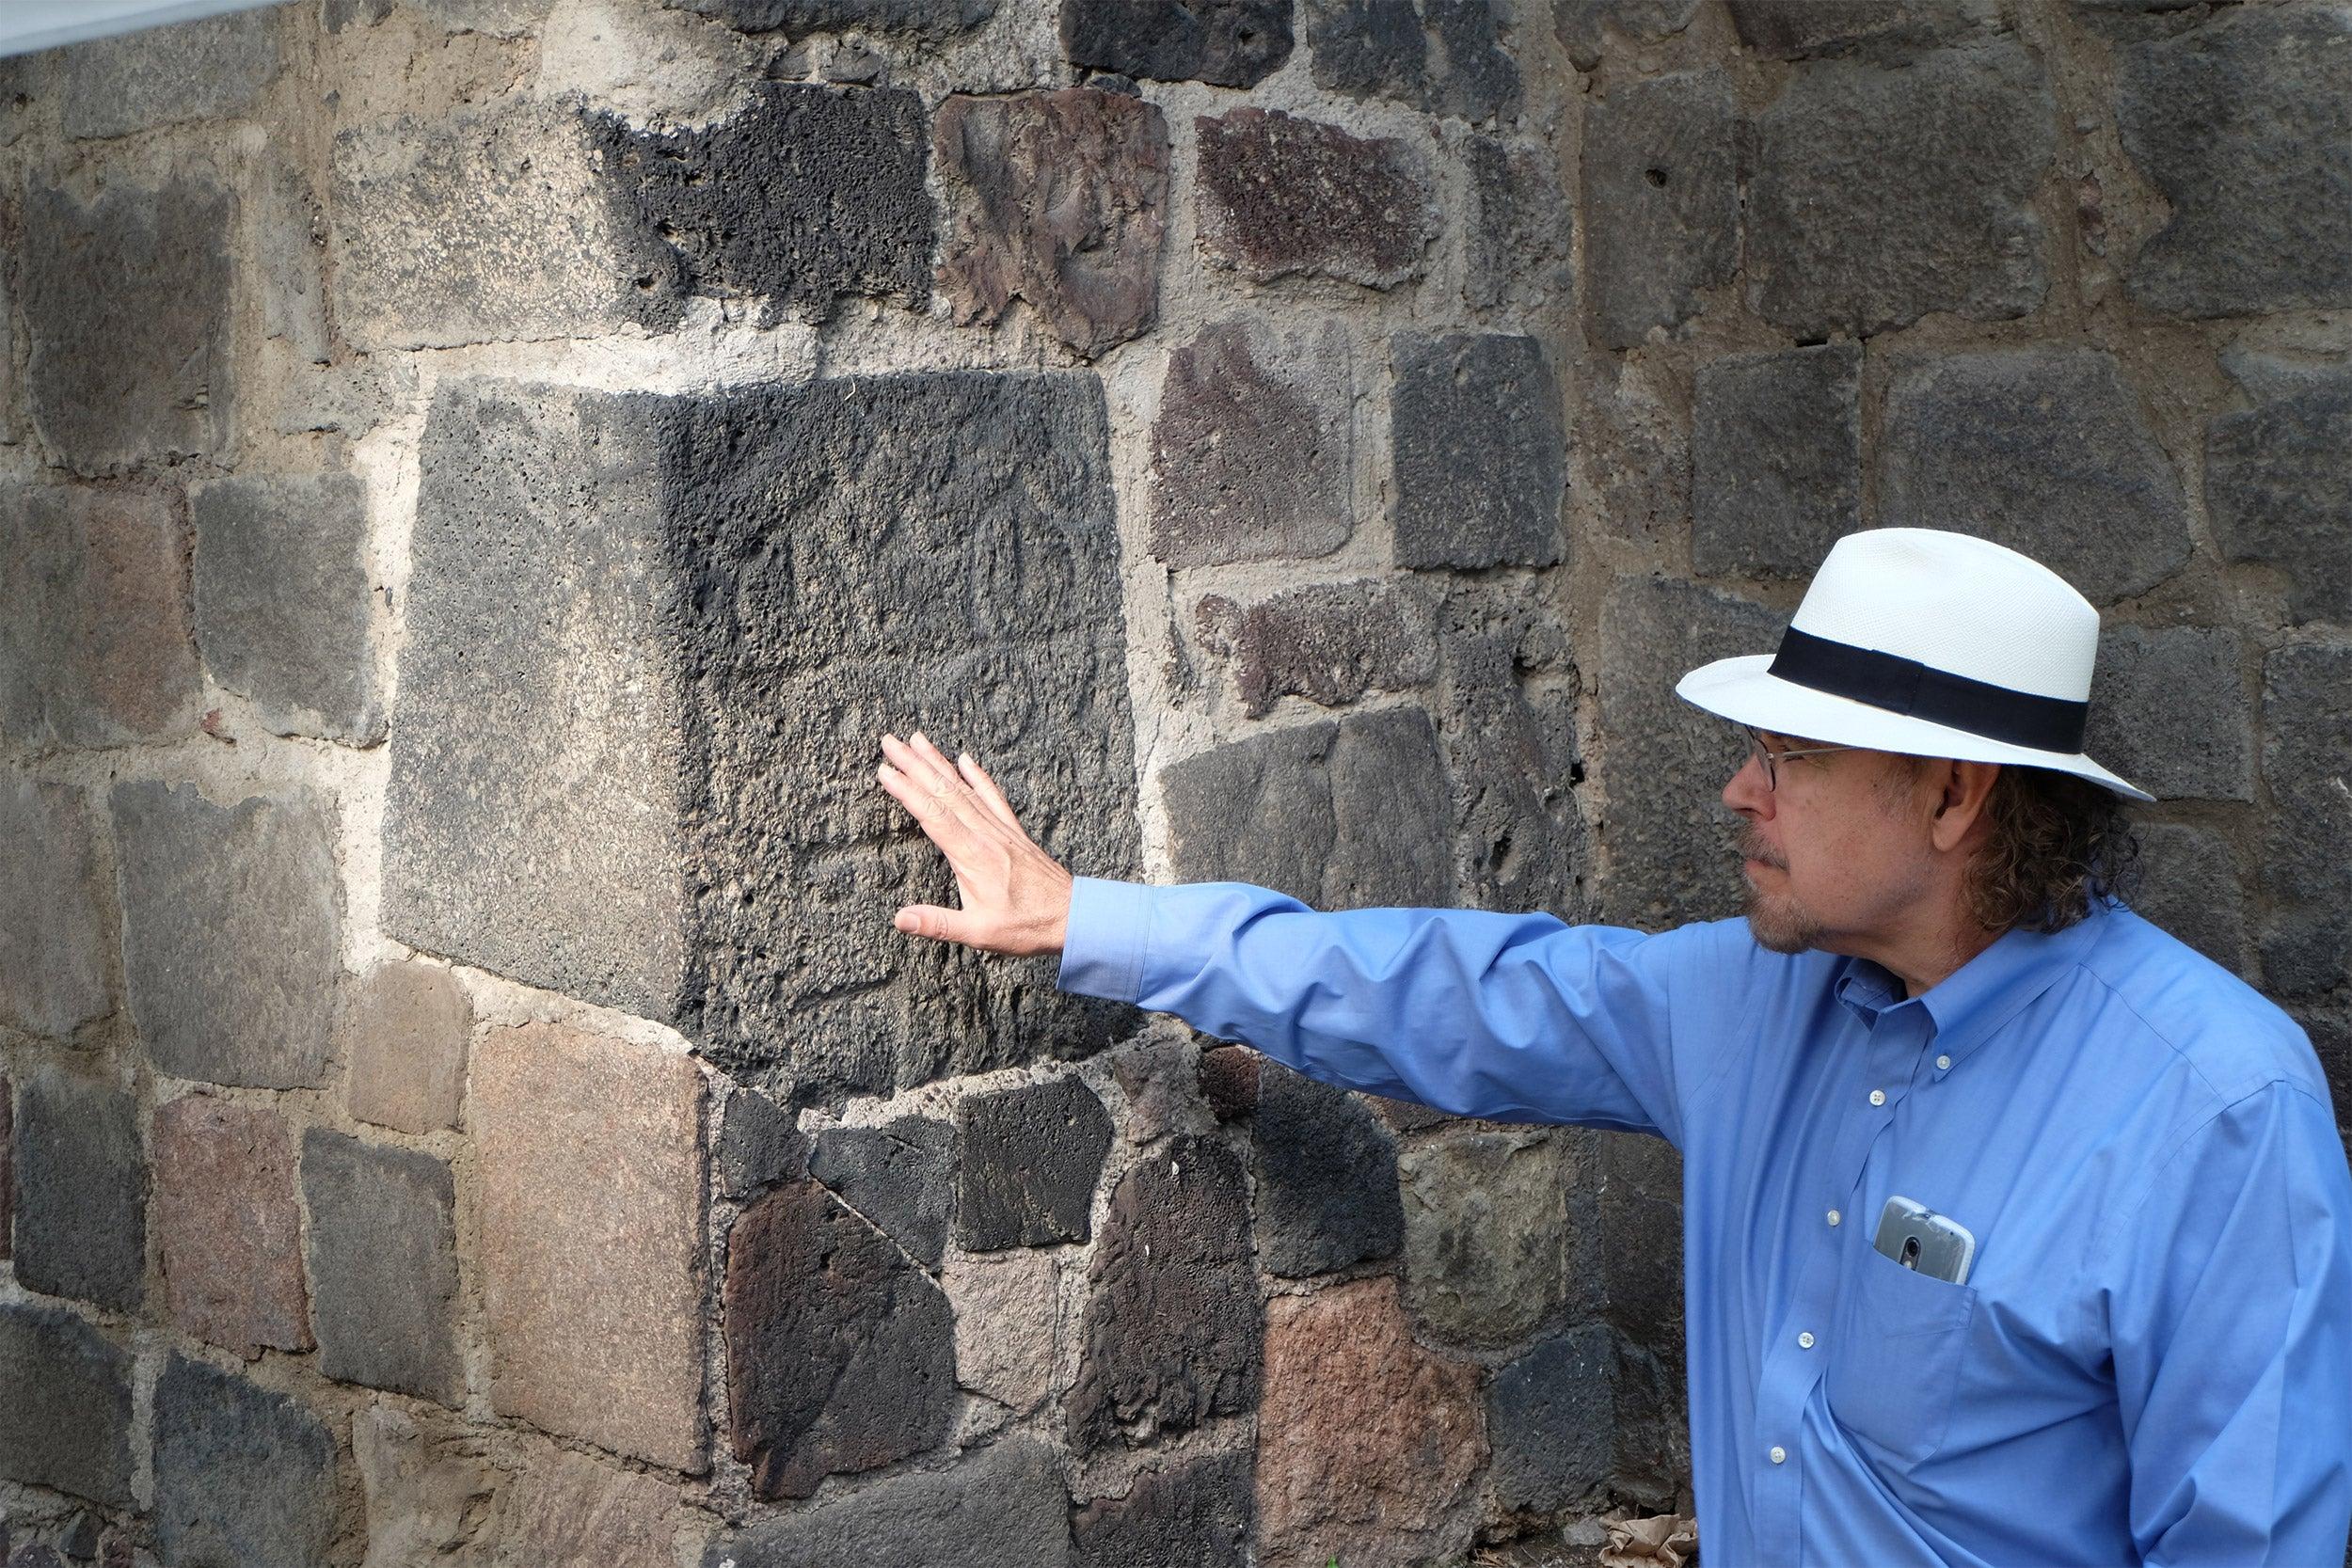 Harvard Professor David Carrasco